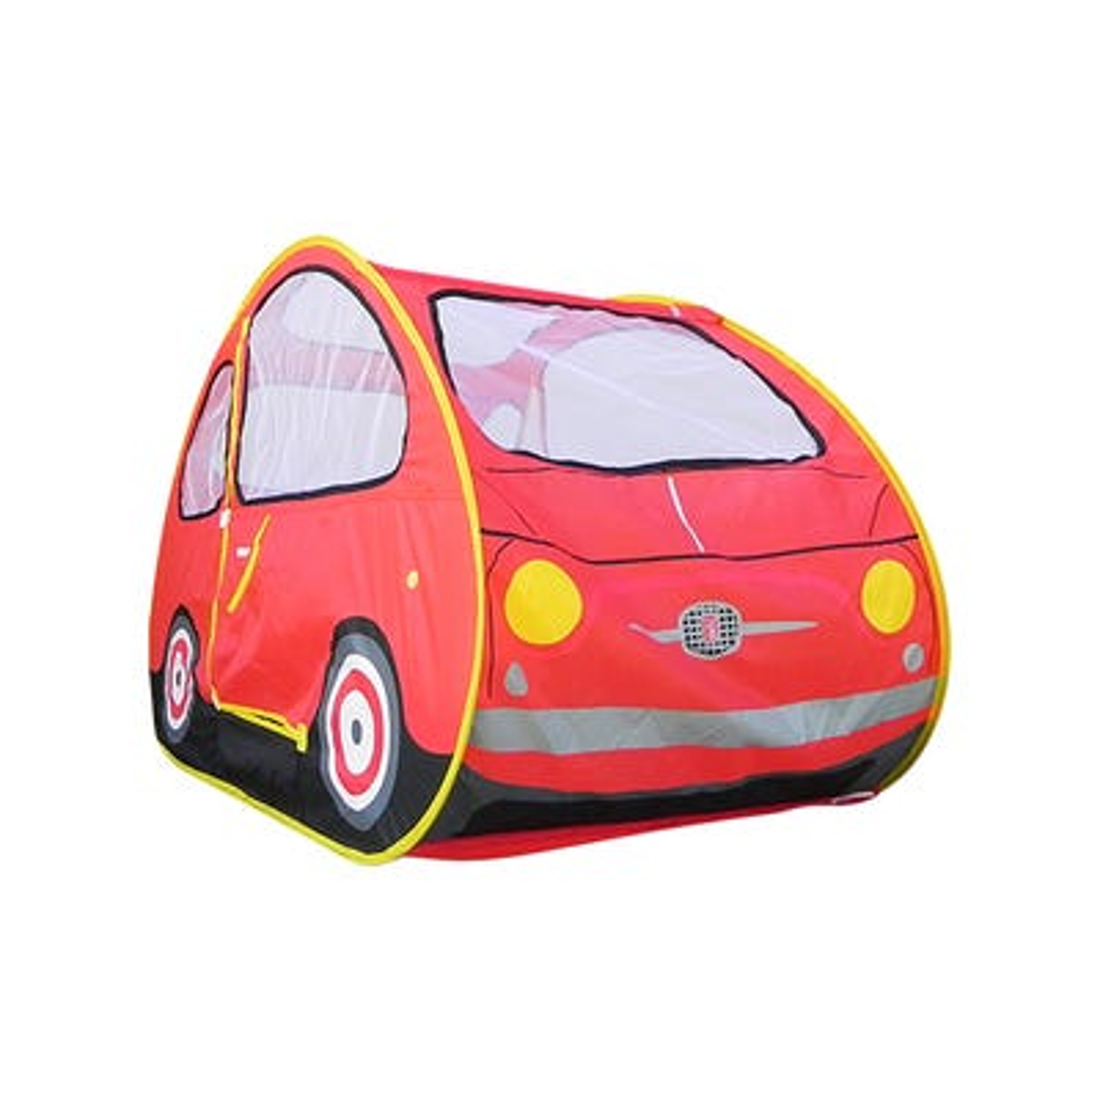 FIAT 500 Children's Pop Up Tent